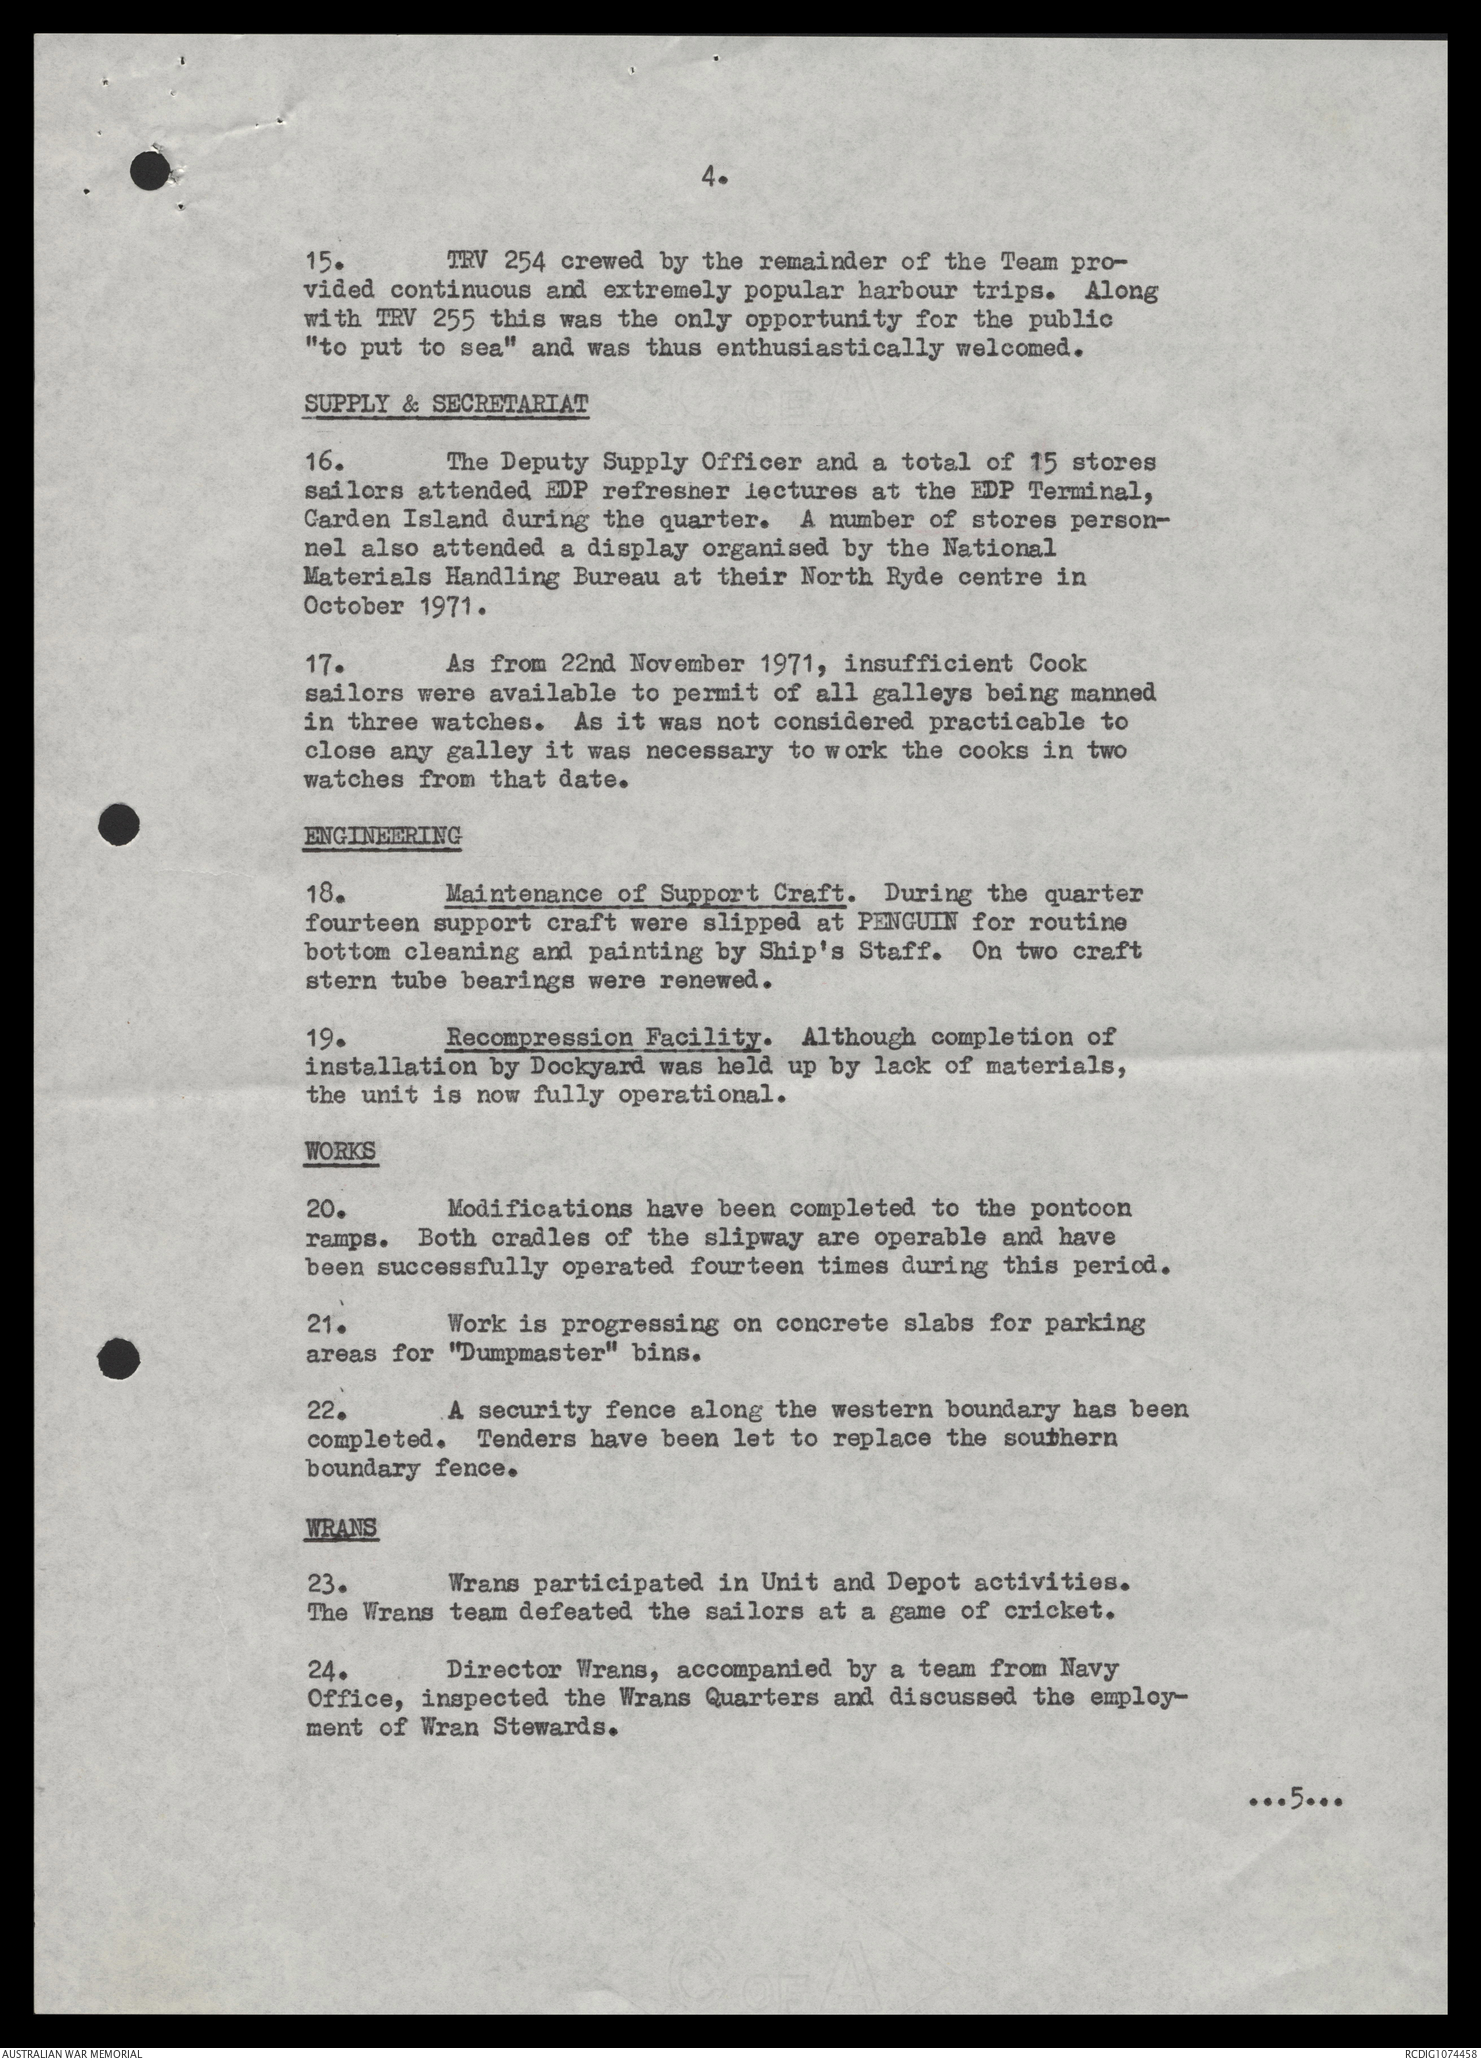 AWM78 440/4 - January 1971 - December 1972 | The Australian War Memorial